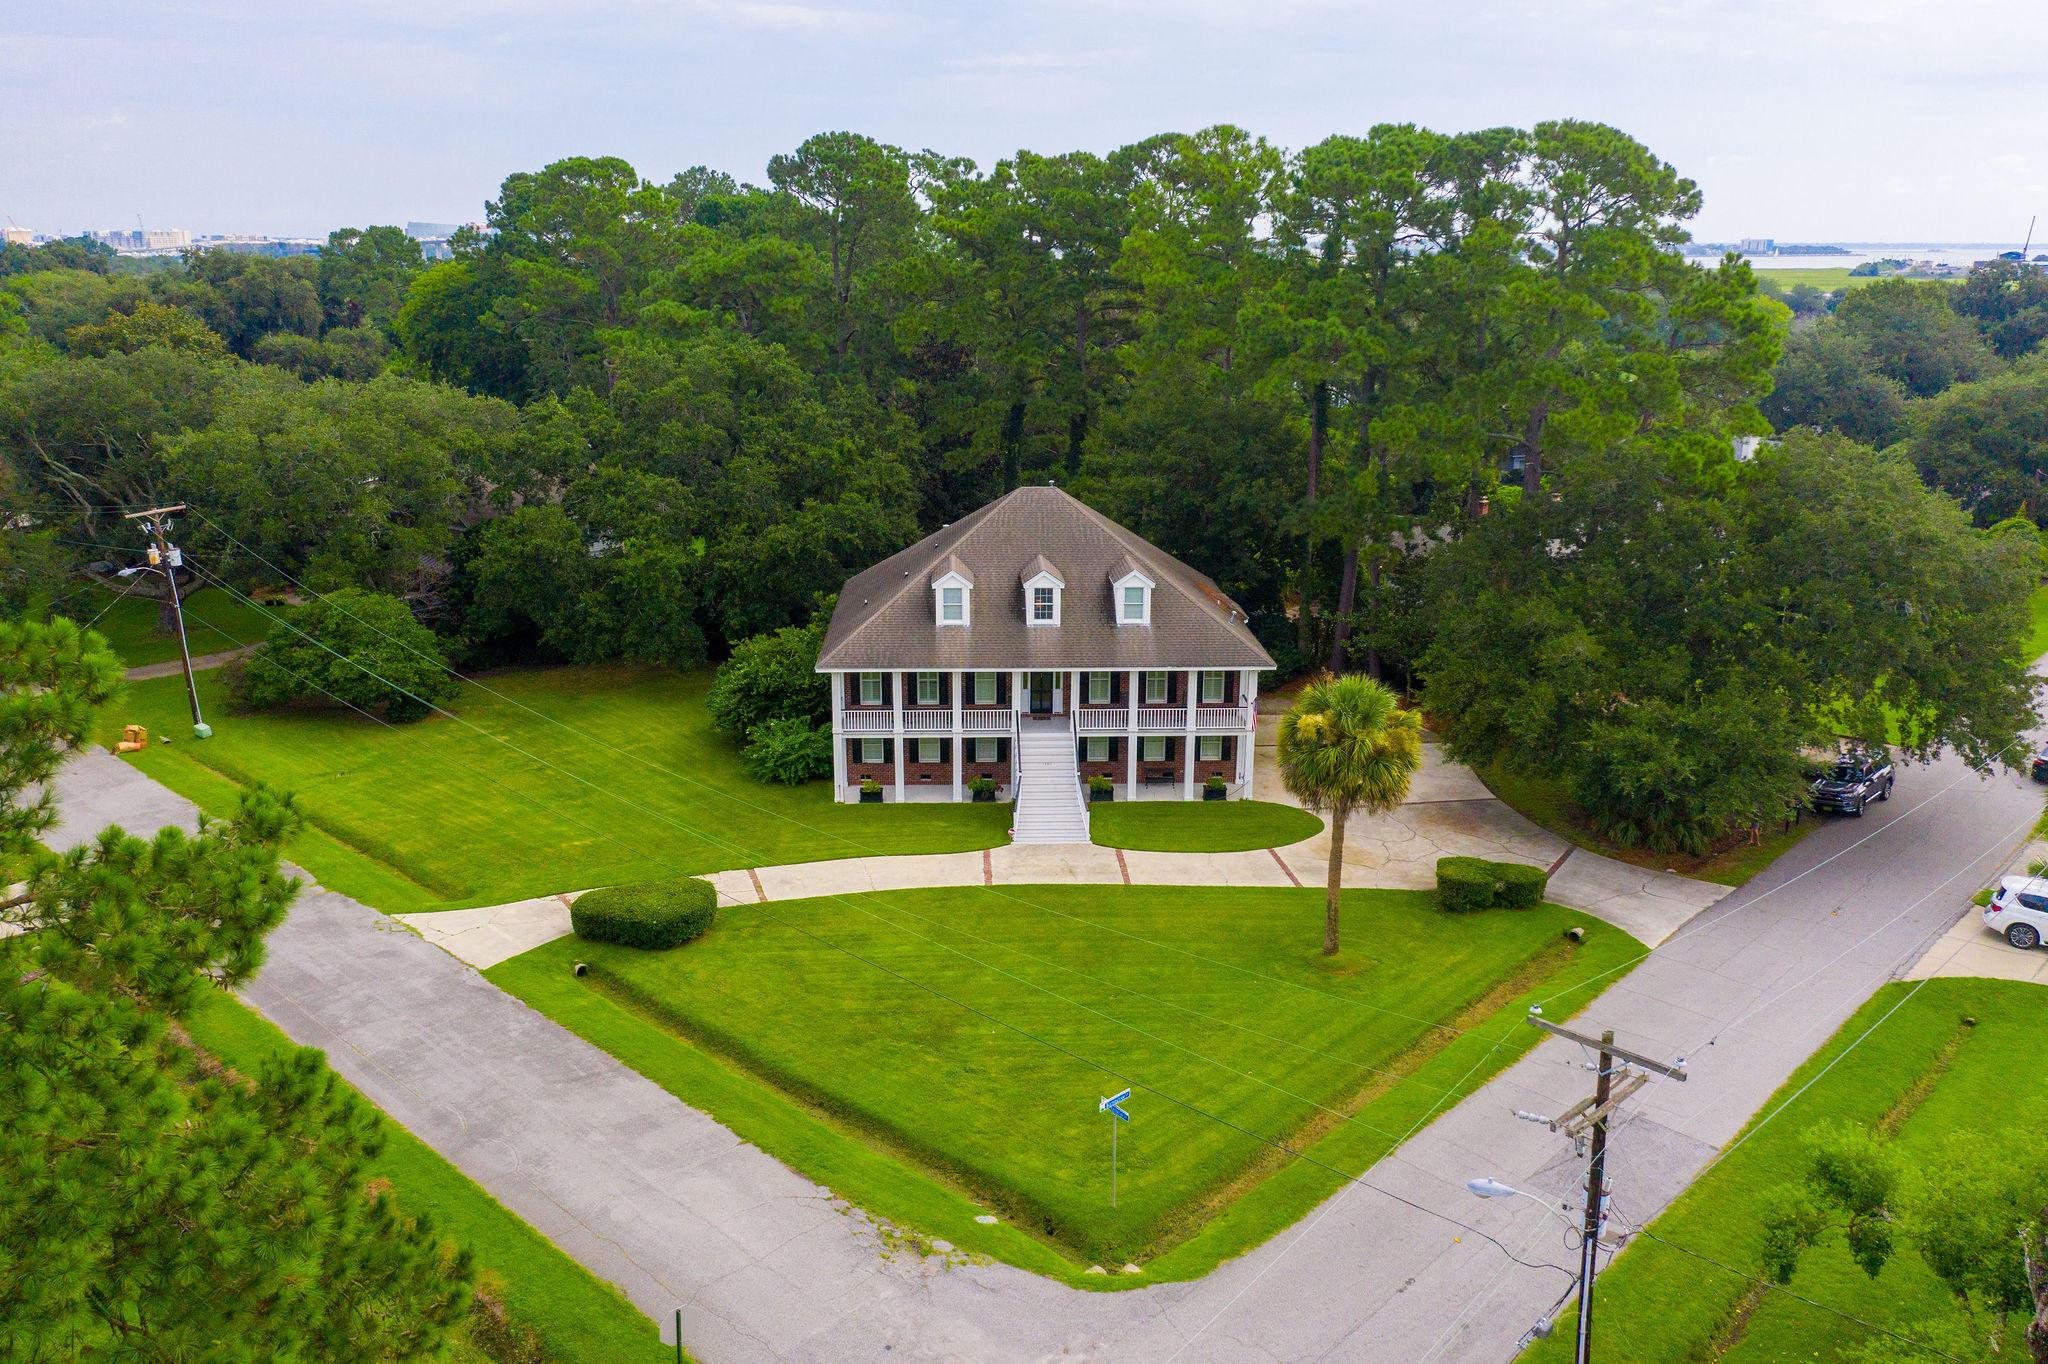 Country Club II Homes For Sale - 1482 Burningtree, Charleston, SC - 4